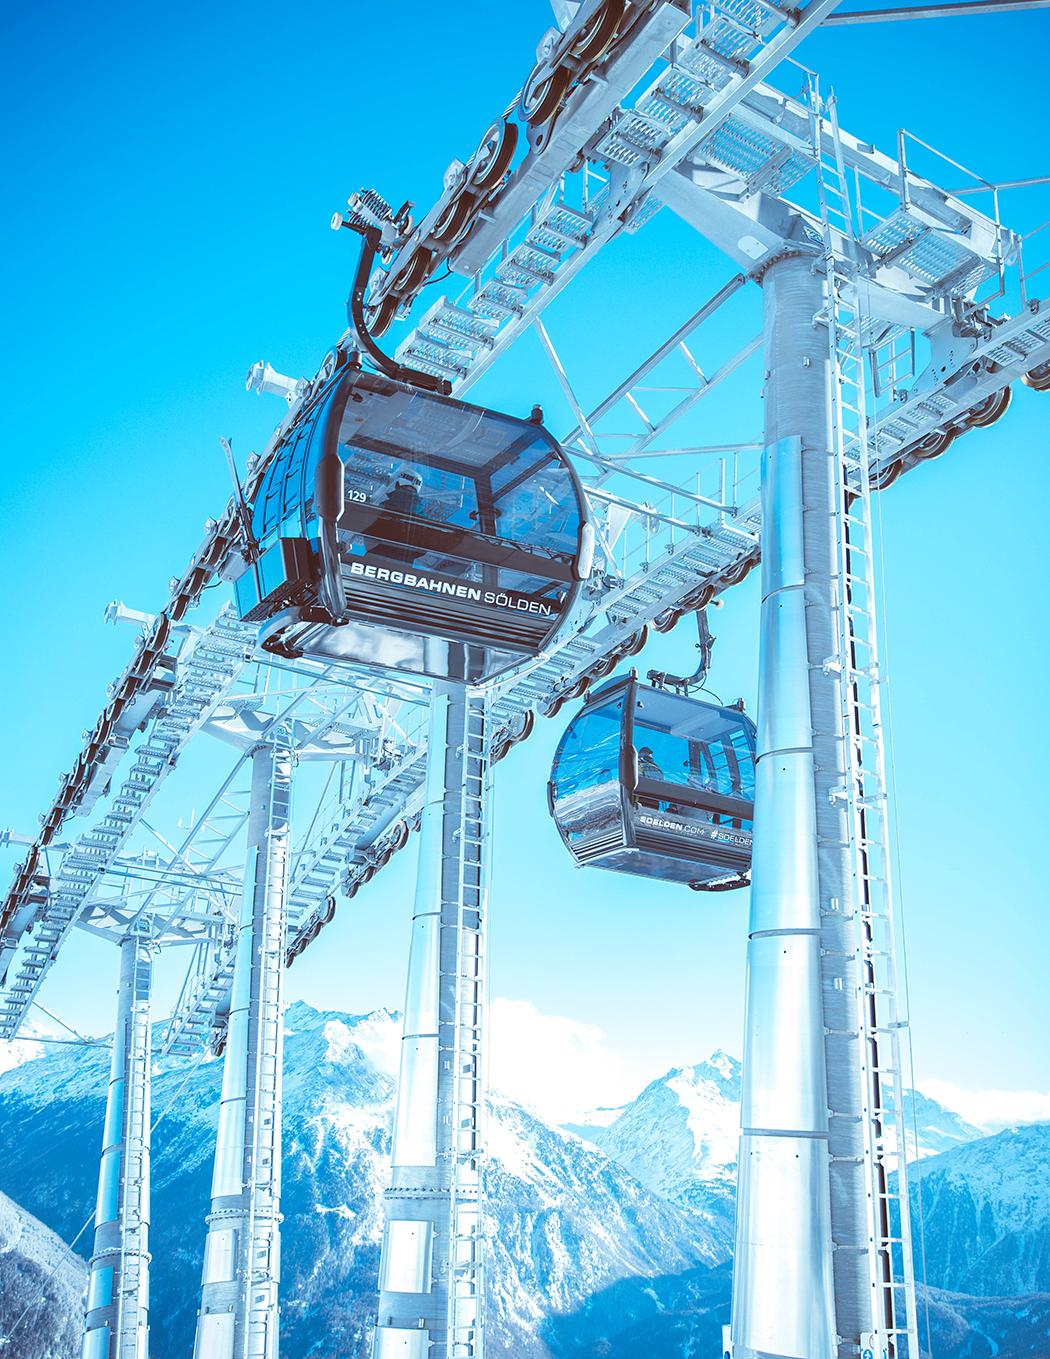 travelblog-travelblogger-travel-blog-blogger-soelden-skifahren-piste-lindarella-muenchen-deutschland-7-web